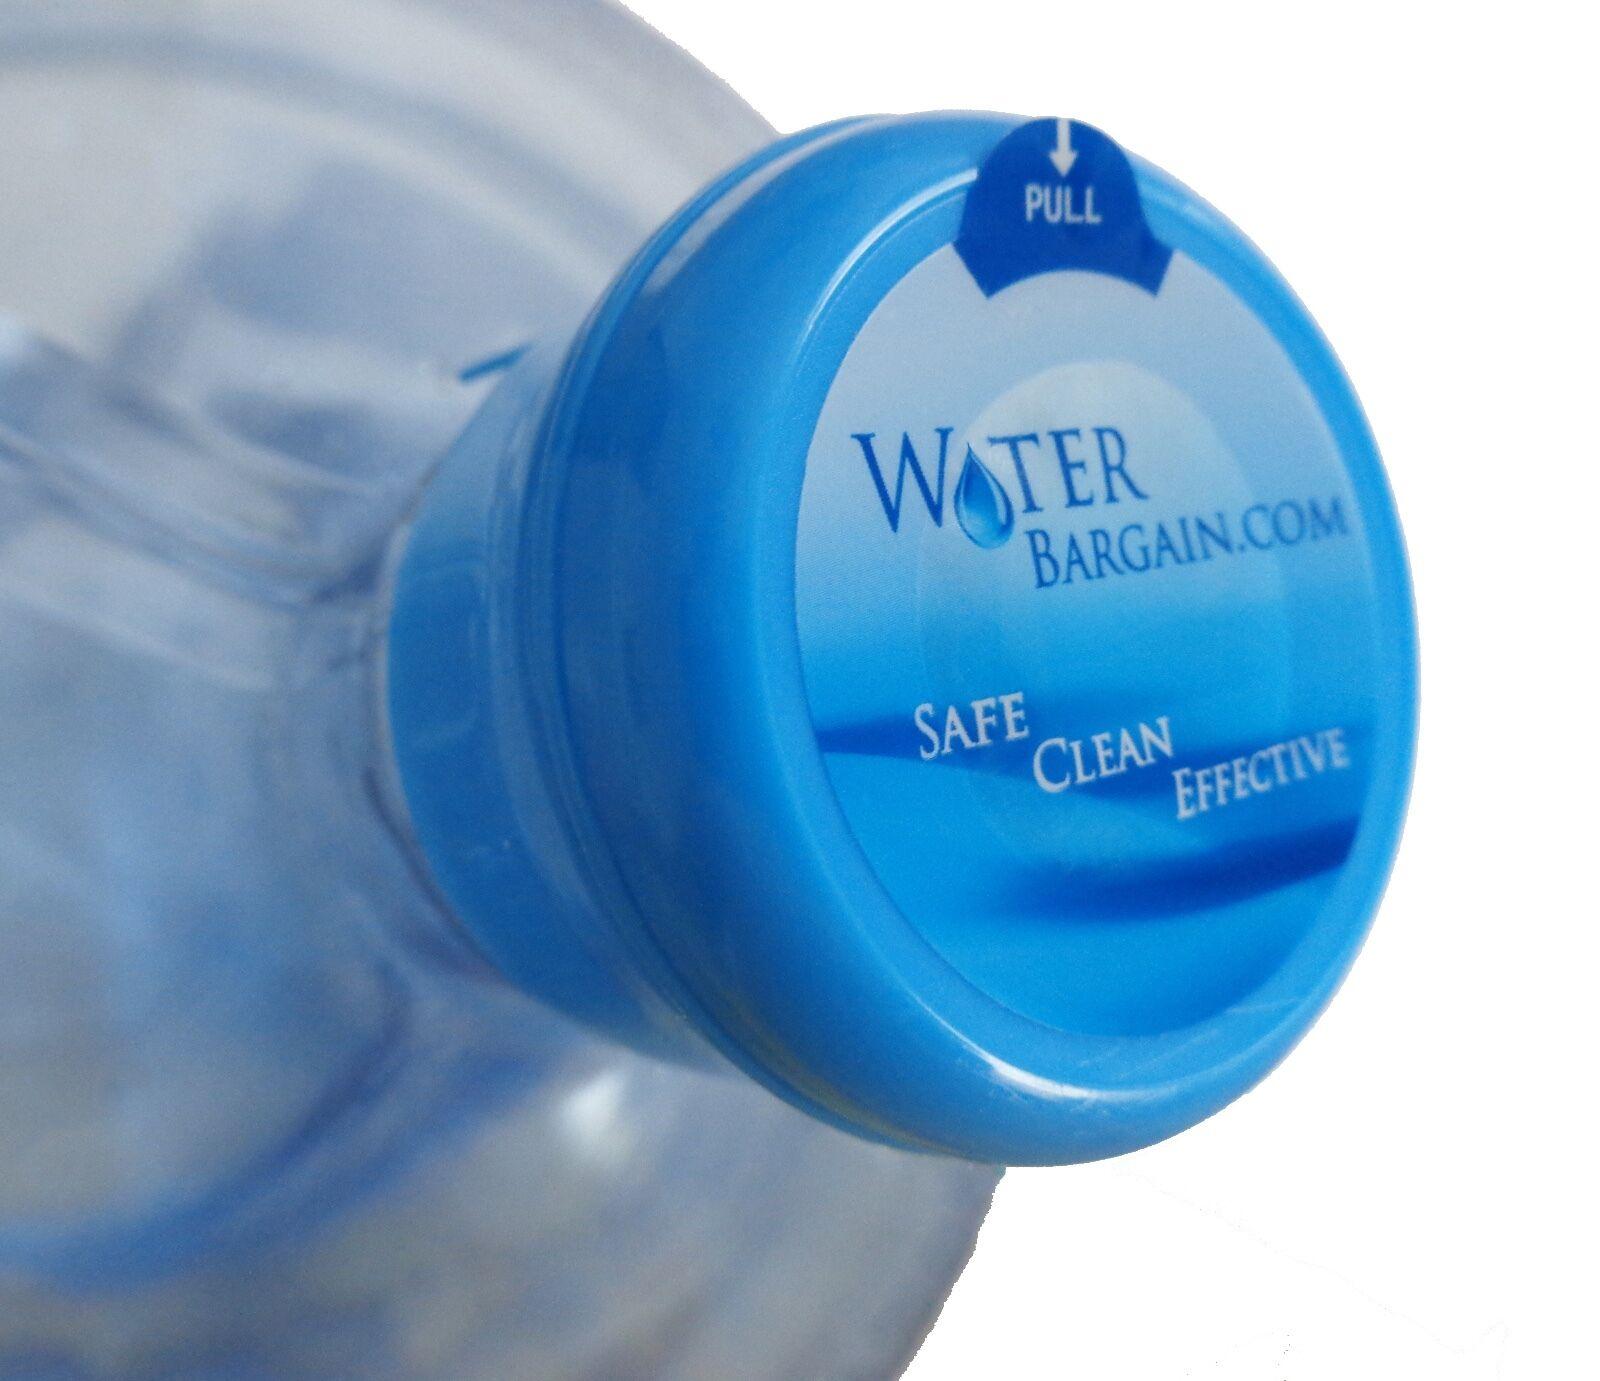 25 PREMIUM NON SPILL WATER COOLER BOTTLE CAPS- WORKS FOR BOT